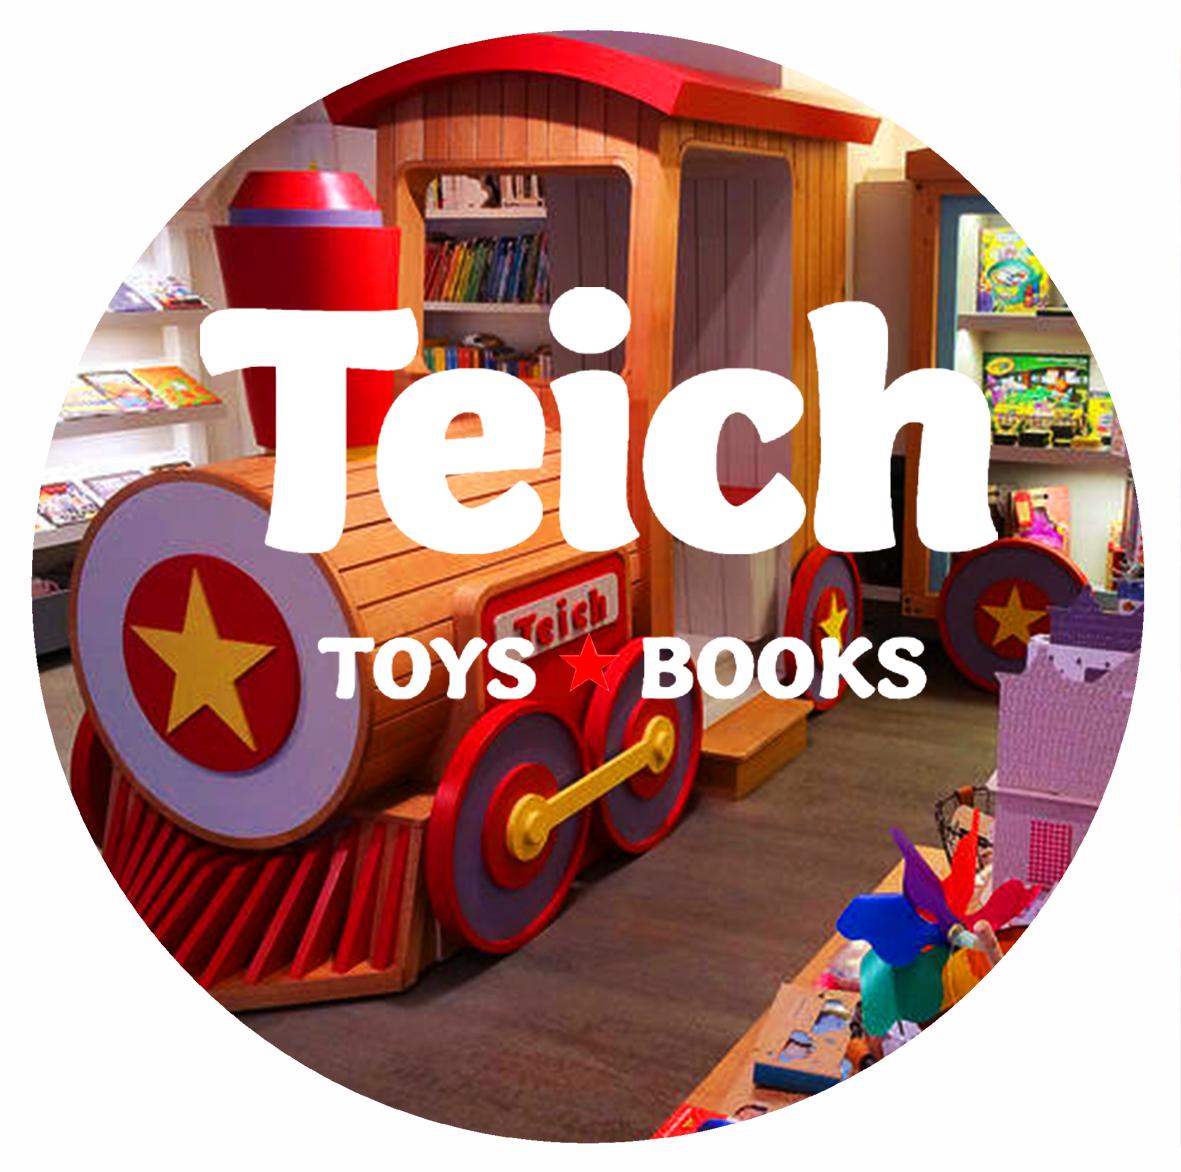 TEICH TOYS & BOOKS 573 Hudson Street, New York, NY 10014